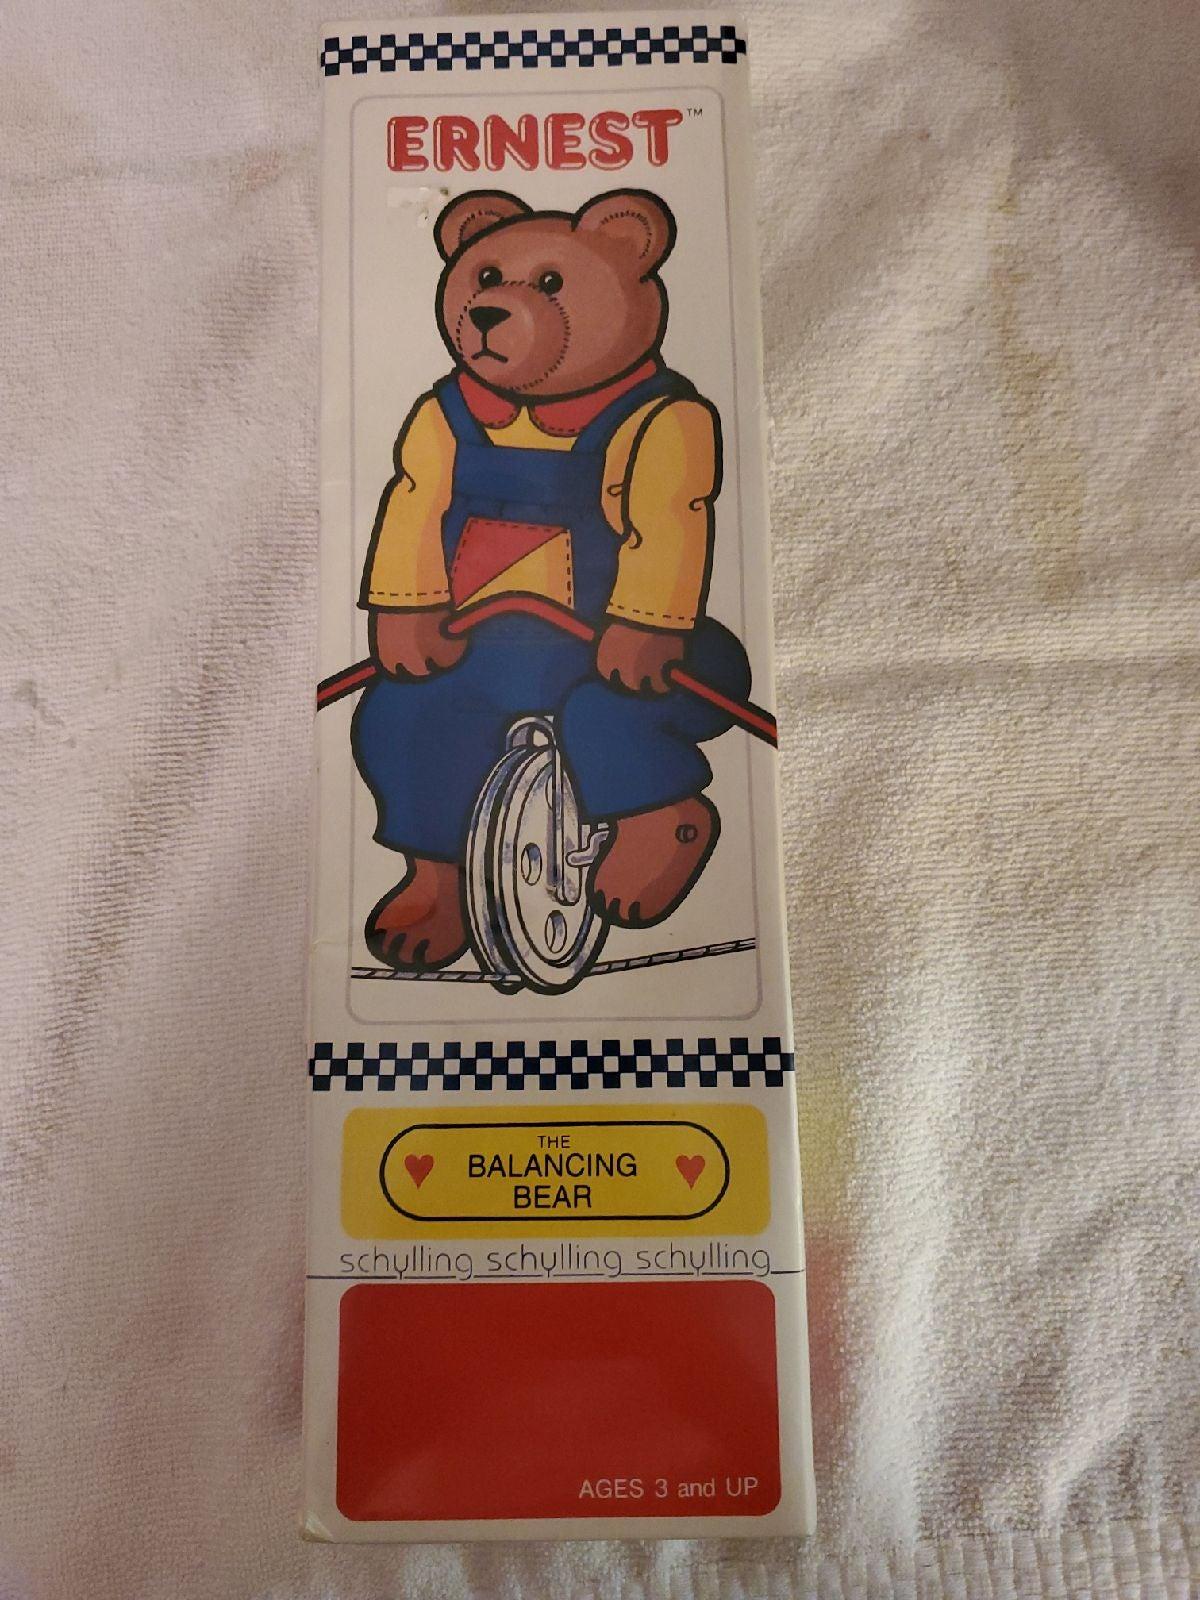 Ernest the Balancing Bear